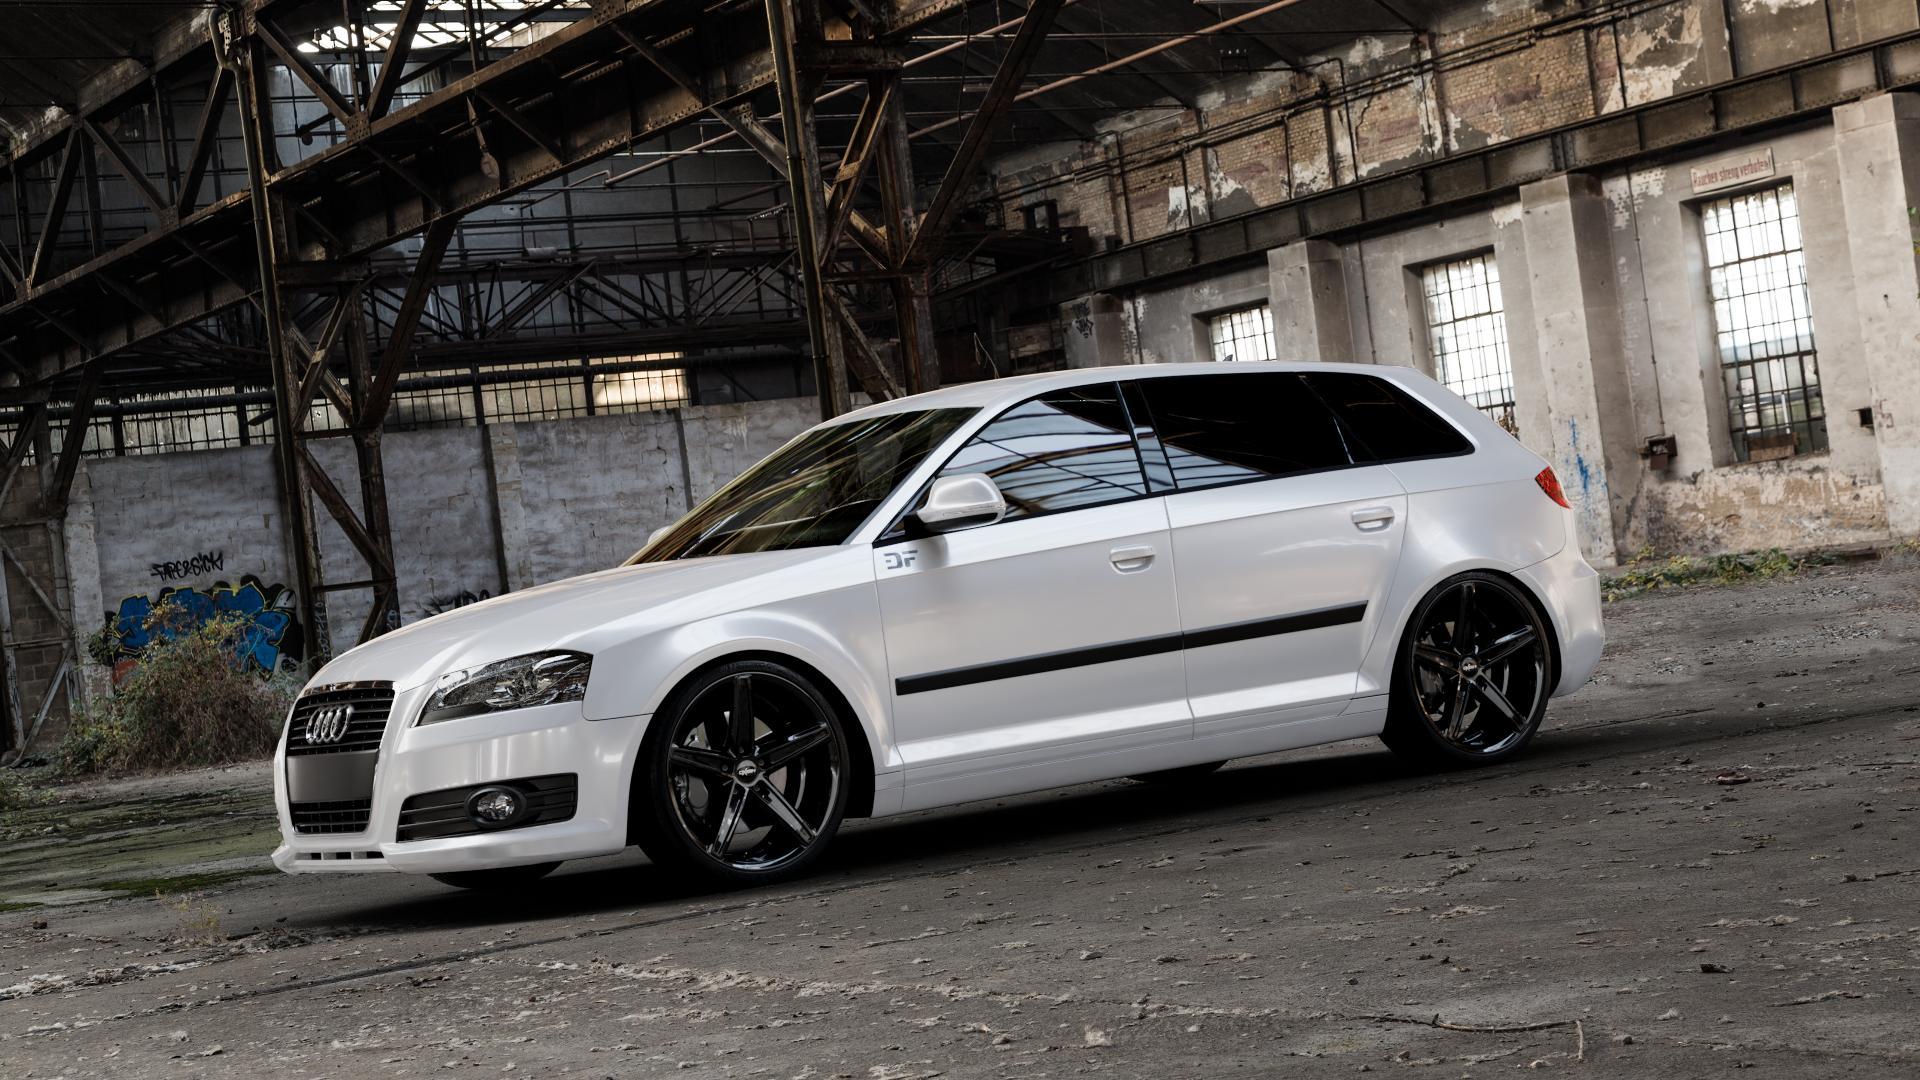 OXIGIN 18 Concave black Felge mit Reifen schwarz in 19Zoll Winterfelge Alufelge auf weissem Audi A3 Typ 8P (Sportback) 1,6l 75kW (102 PS) 2,0l FSI 110kW (150 1,9l TDI 77kW (105 103kW (140 TFSI 147kW (200 85kW (116 100kW (136 1,8l 118kW (160 125kW (170 1,4l 92kW (125 120kW (163 quattro 3,2l V6 184kW (250 S3 195kW (265 1,2l 66kW (90 18